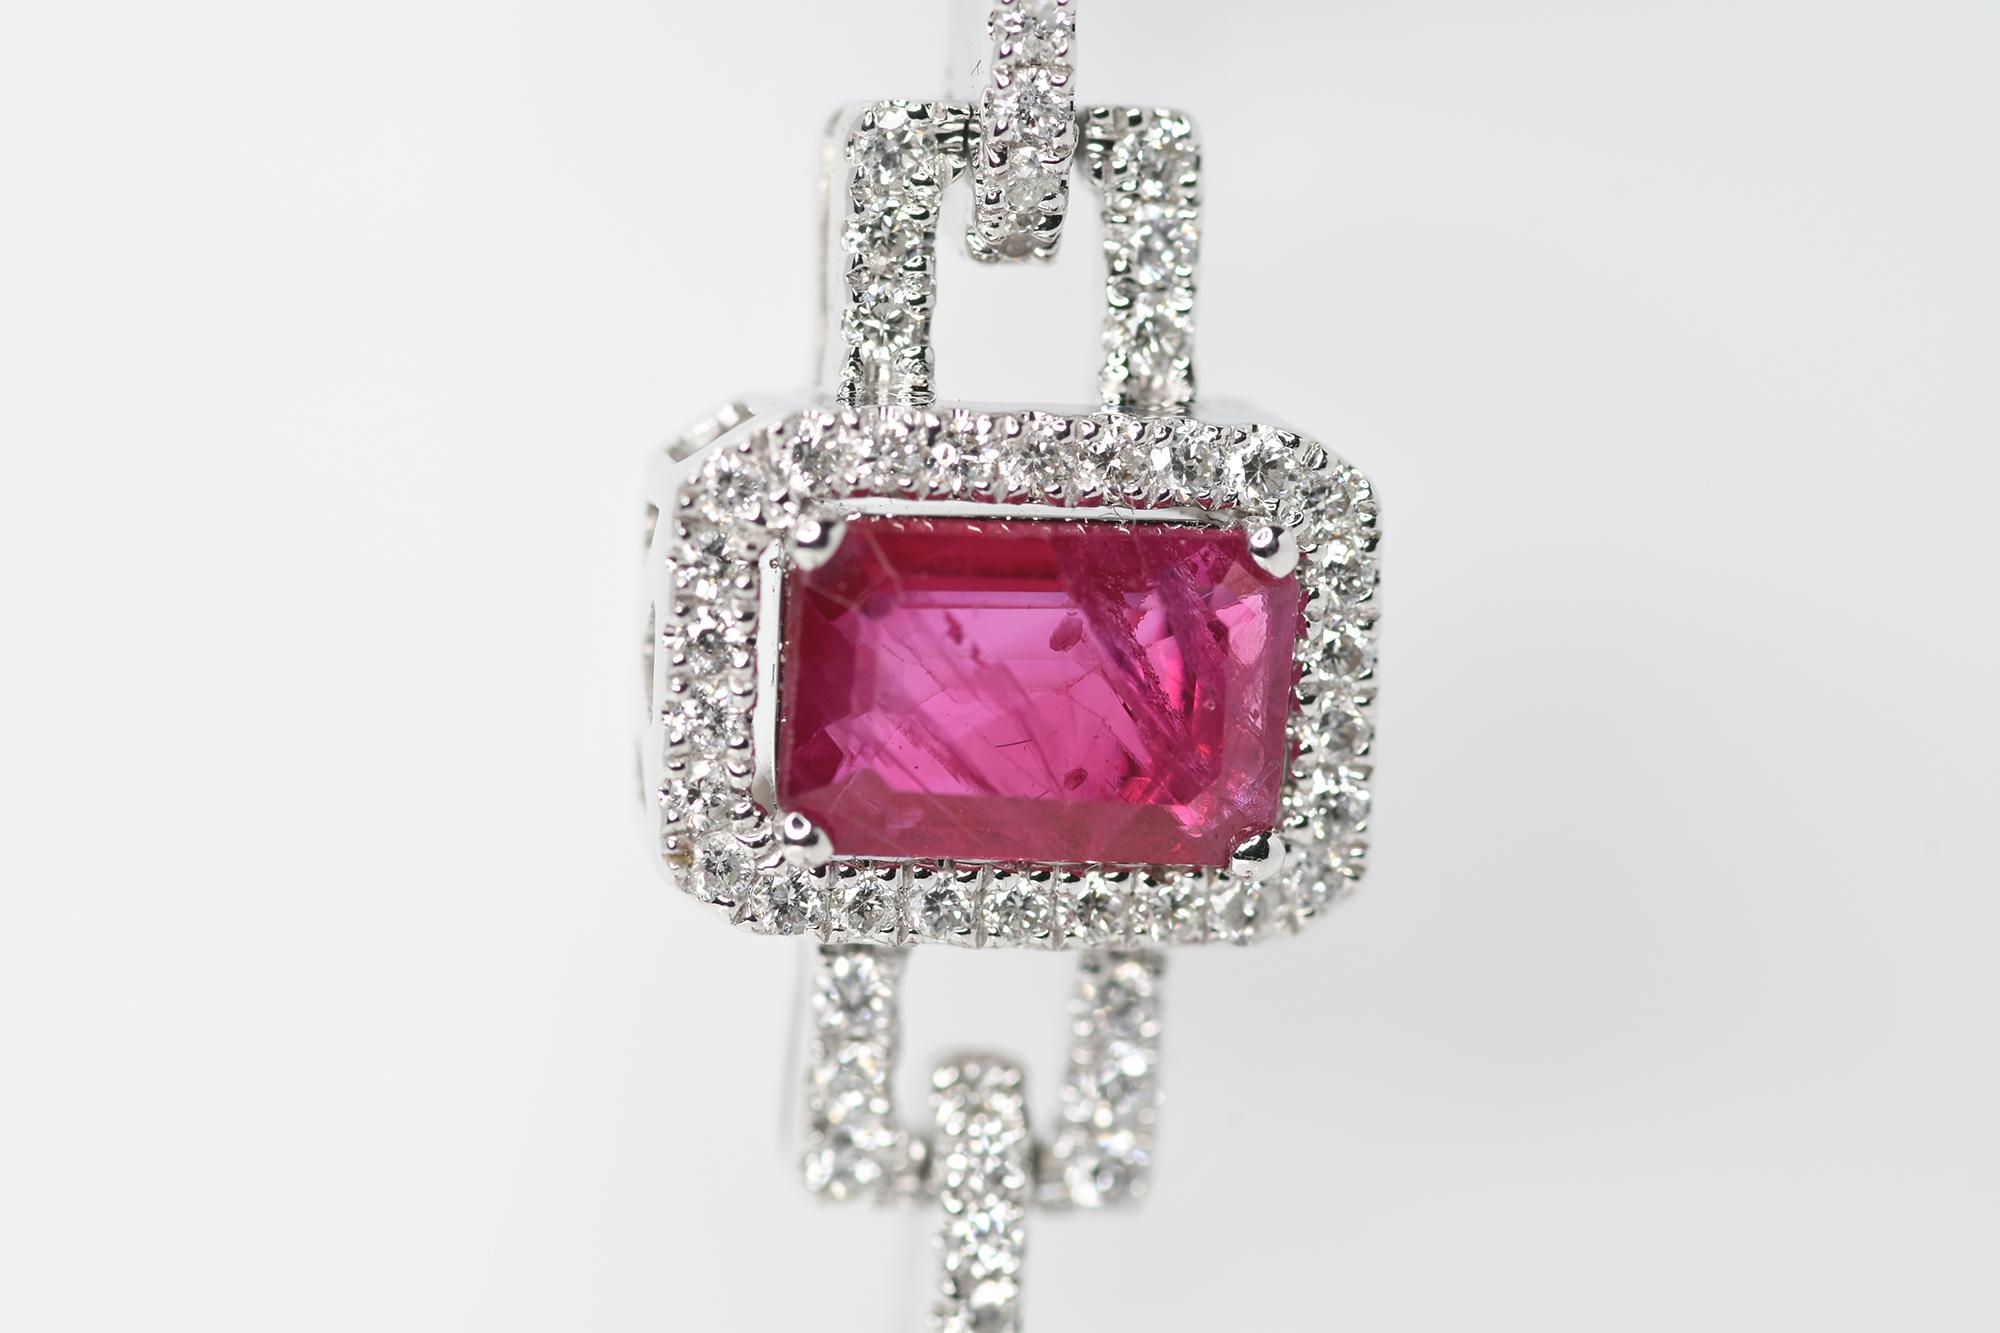 Ruby & Diamond Bracelet - Image 3 of 3